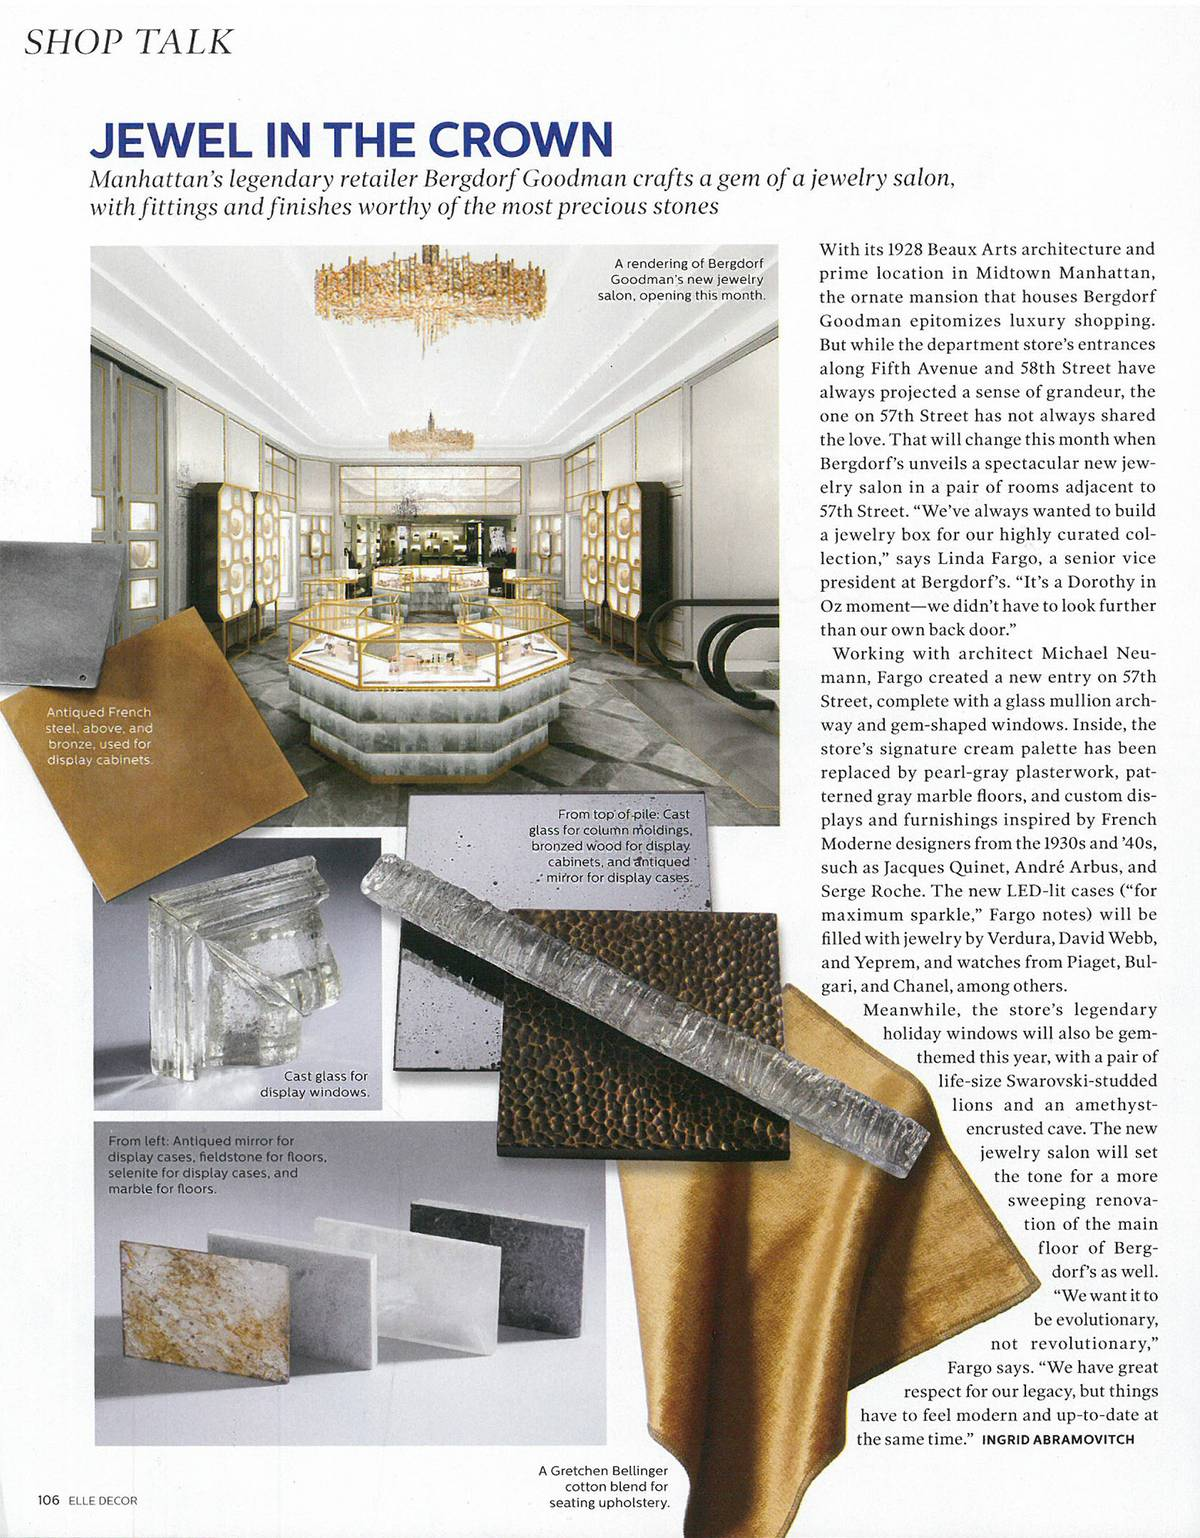 Bergdorf Goodman Jewelry Salon in Elle Decor - Architect: Neumann & Rudy